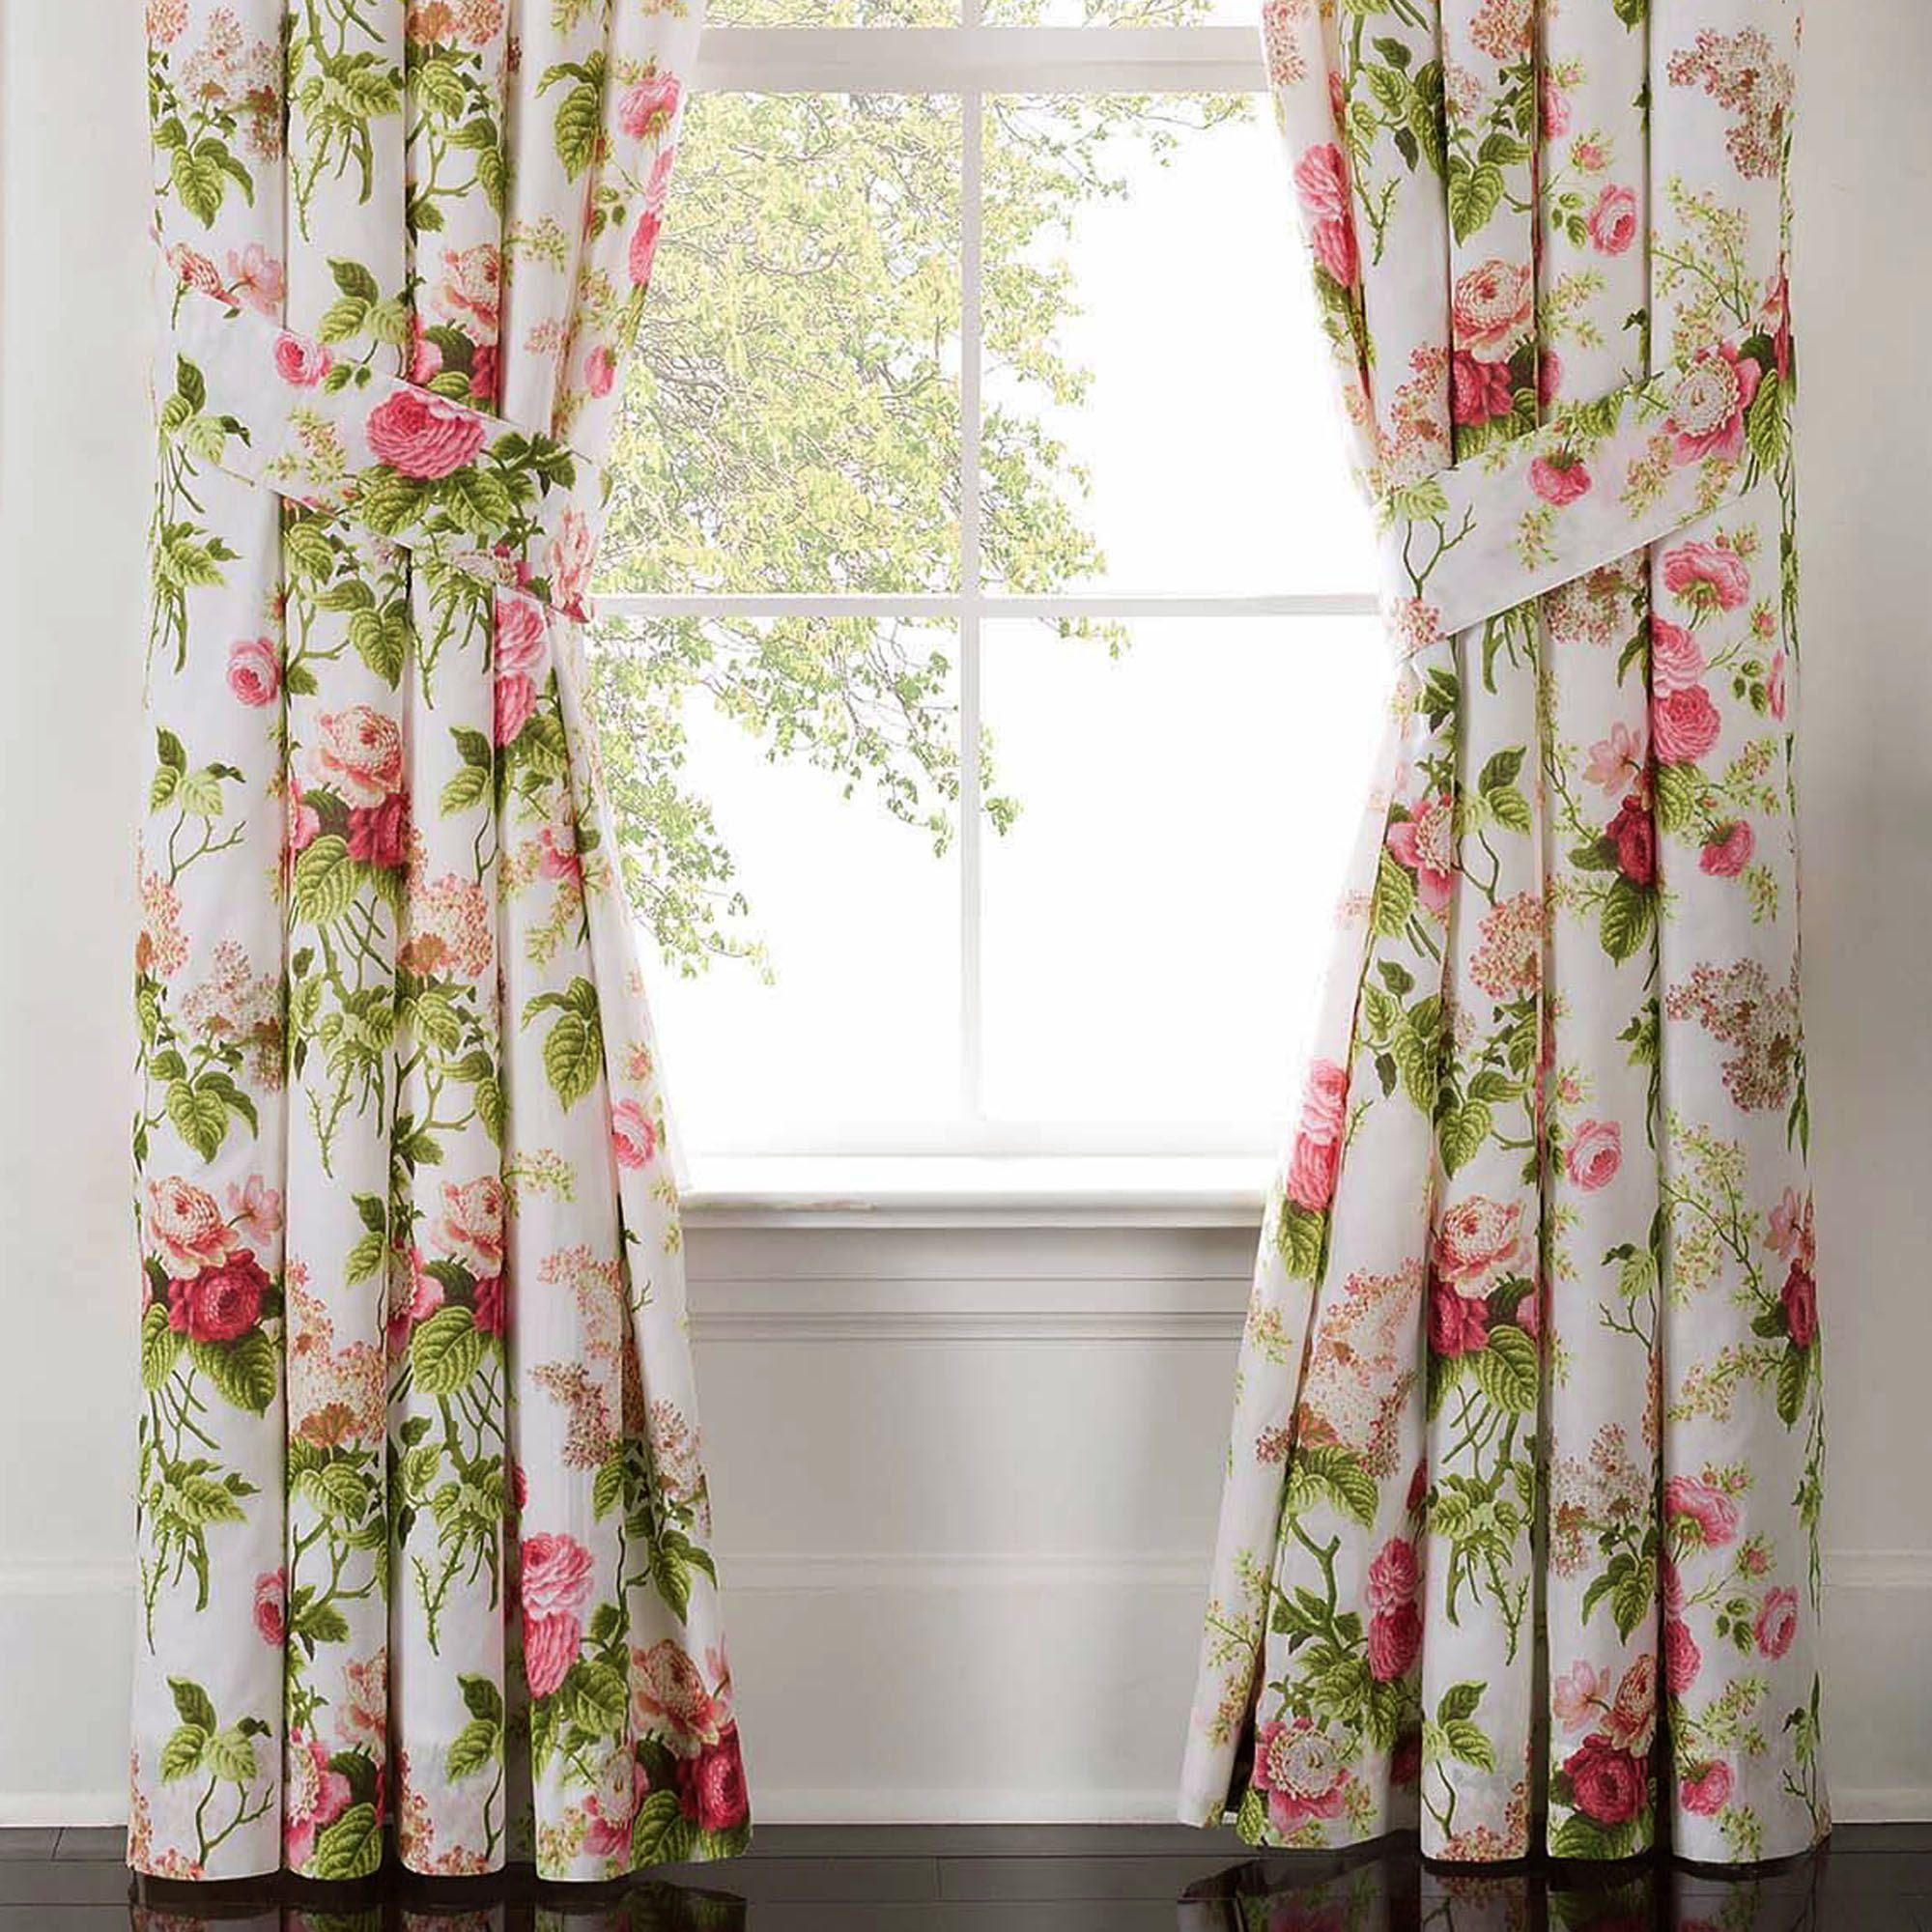 Emmas Garden Floral Window Treatment by Waverly